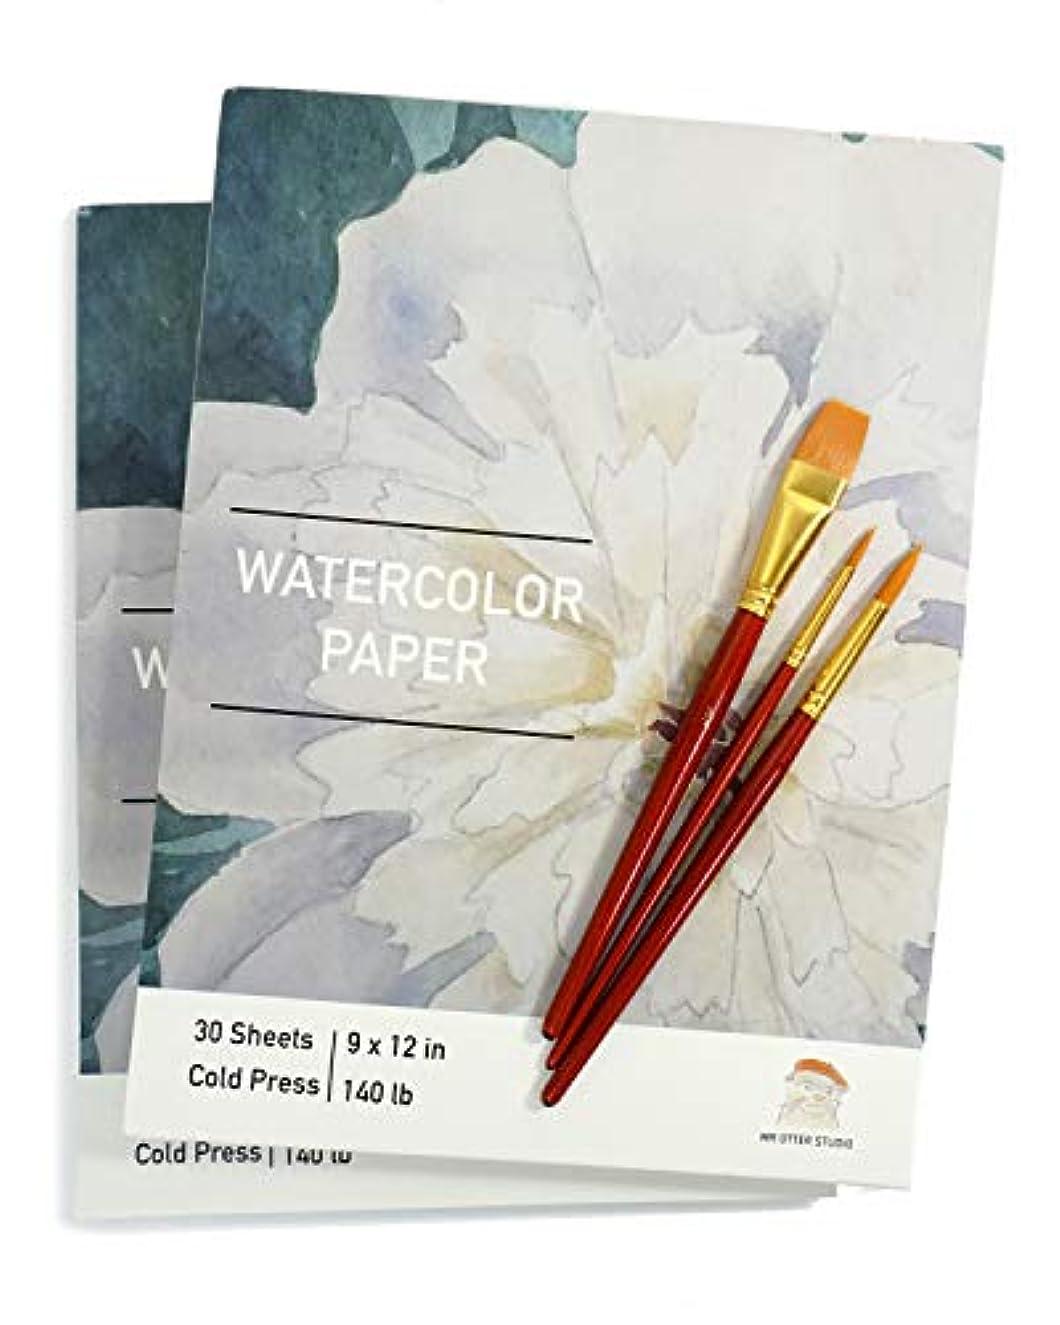 Mr Otter Studio Watercolor Paper Sketchbook 2 Pack, Textured 9